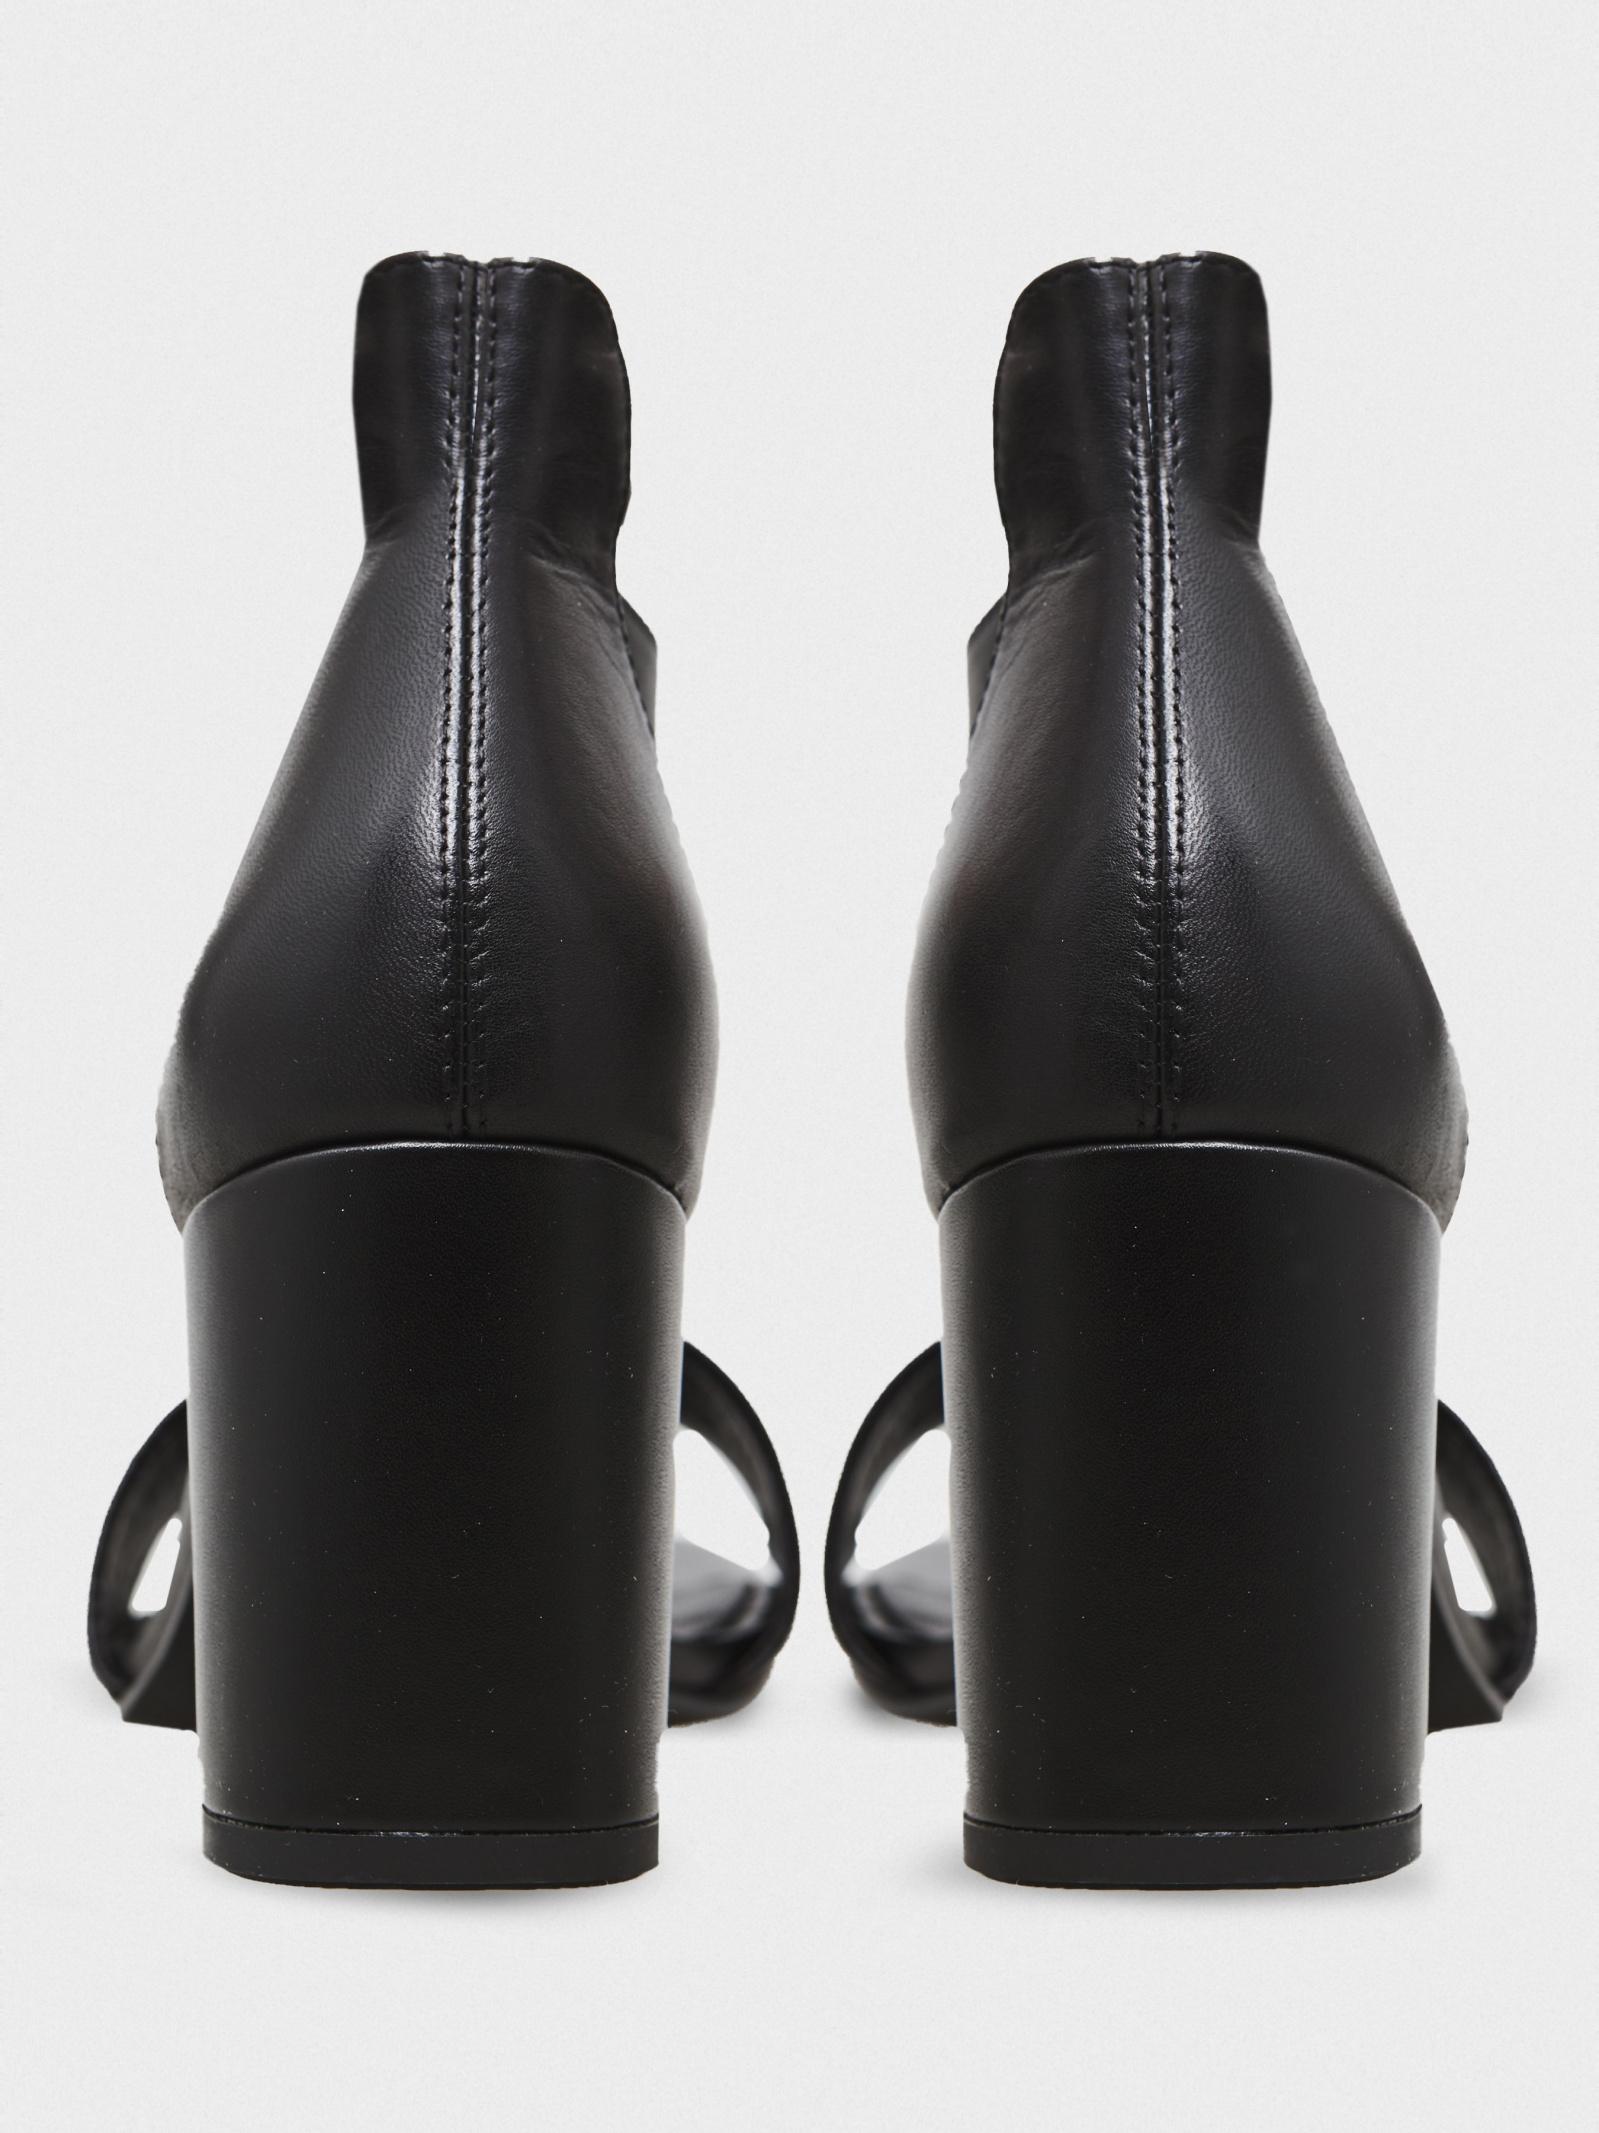 Босоніжки  для жінок VAGABOND PENNY 4738-001-20 продаж, 2017